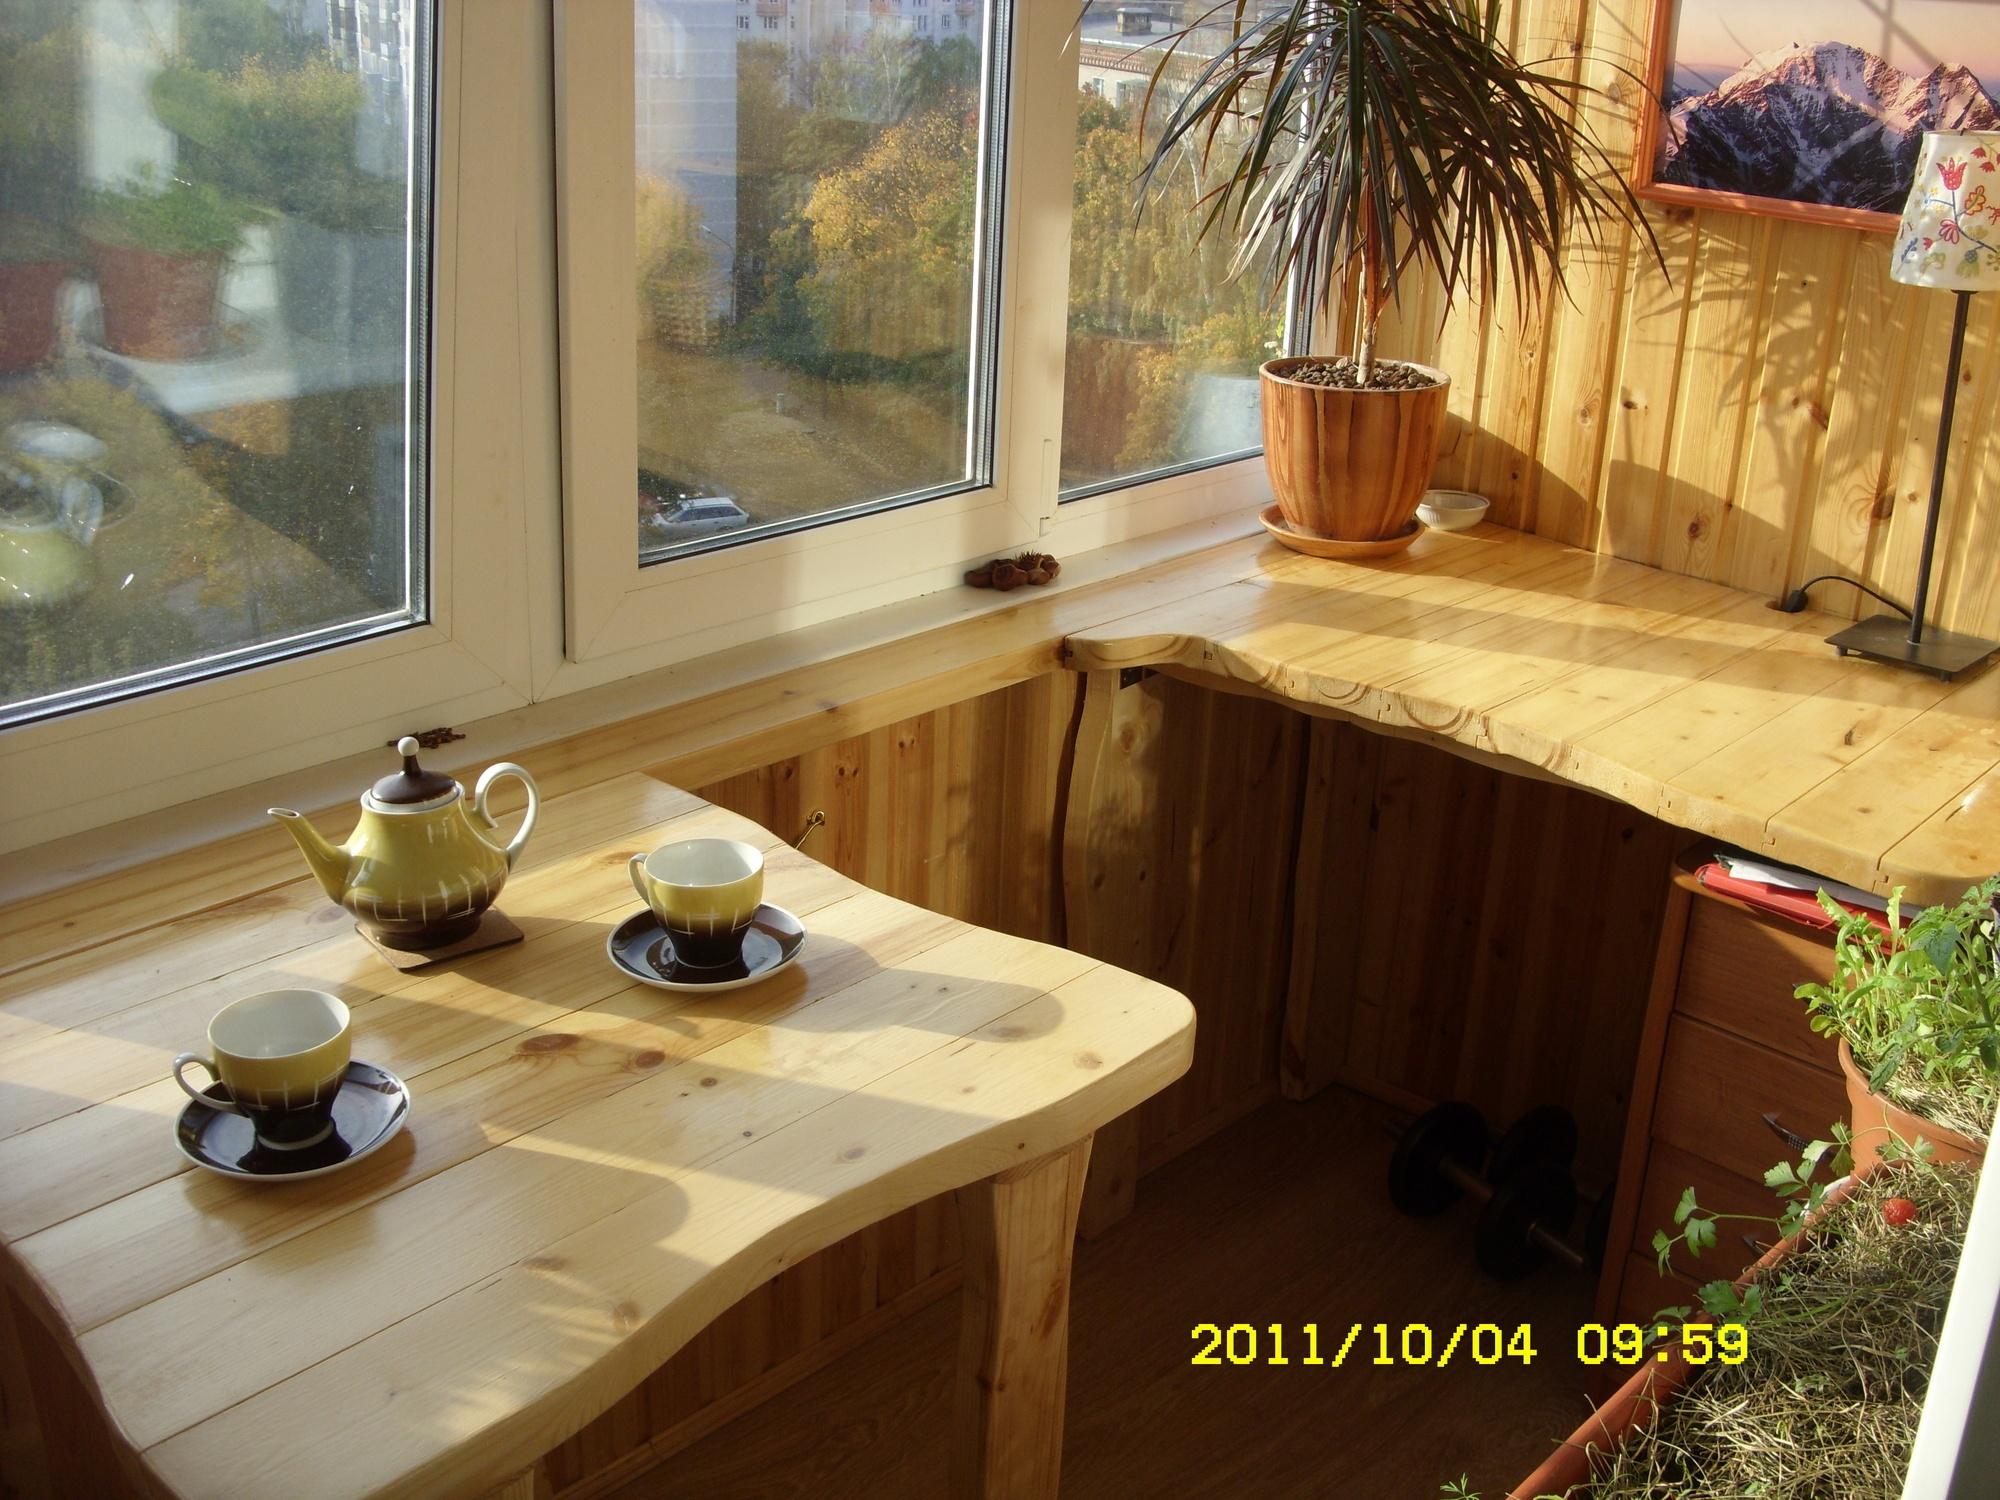 Предложение: остекление квартир, лоджий, балкона, отделка, г.